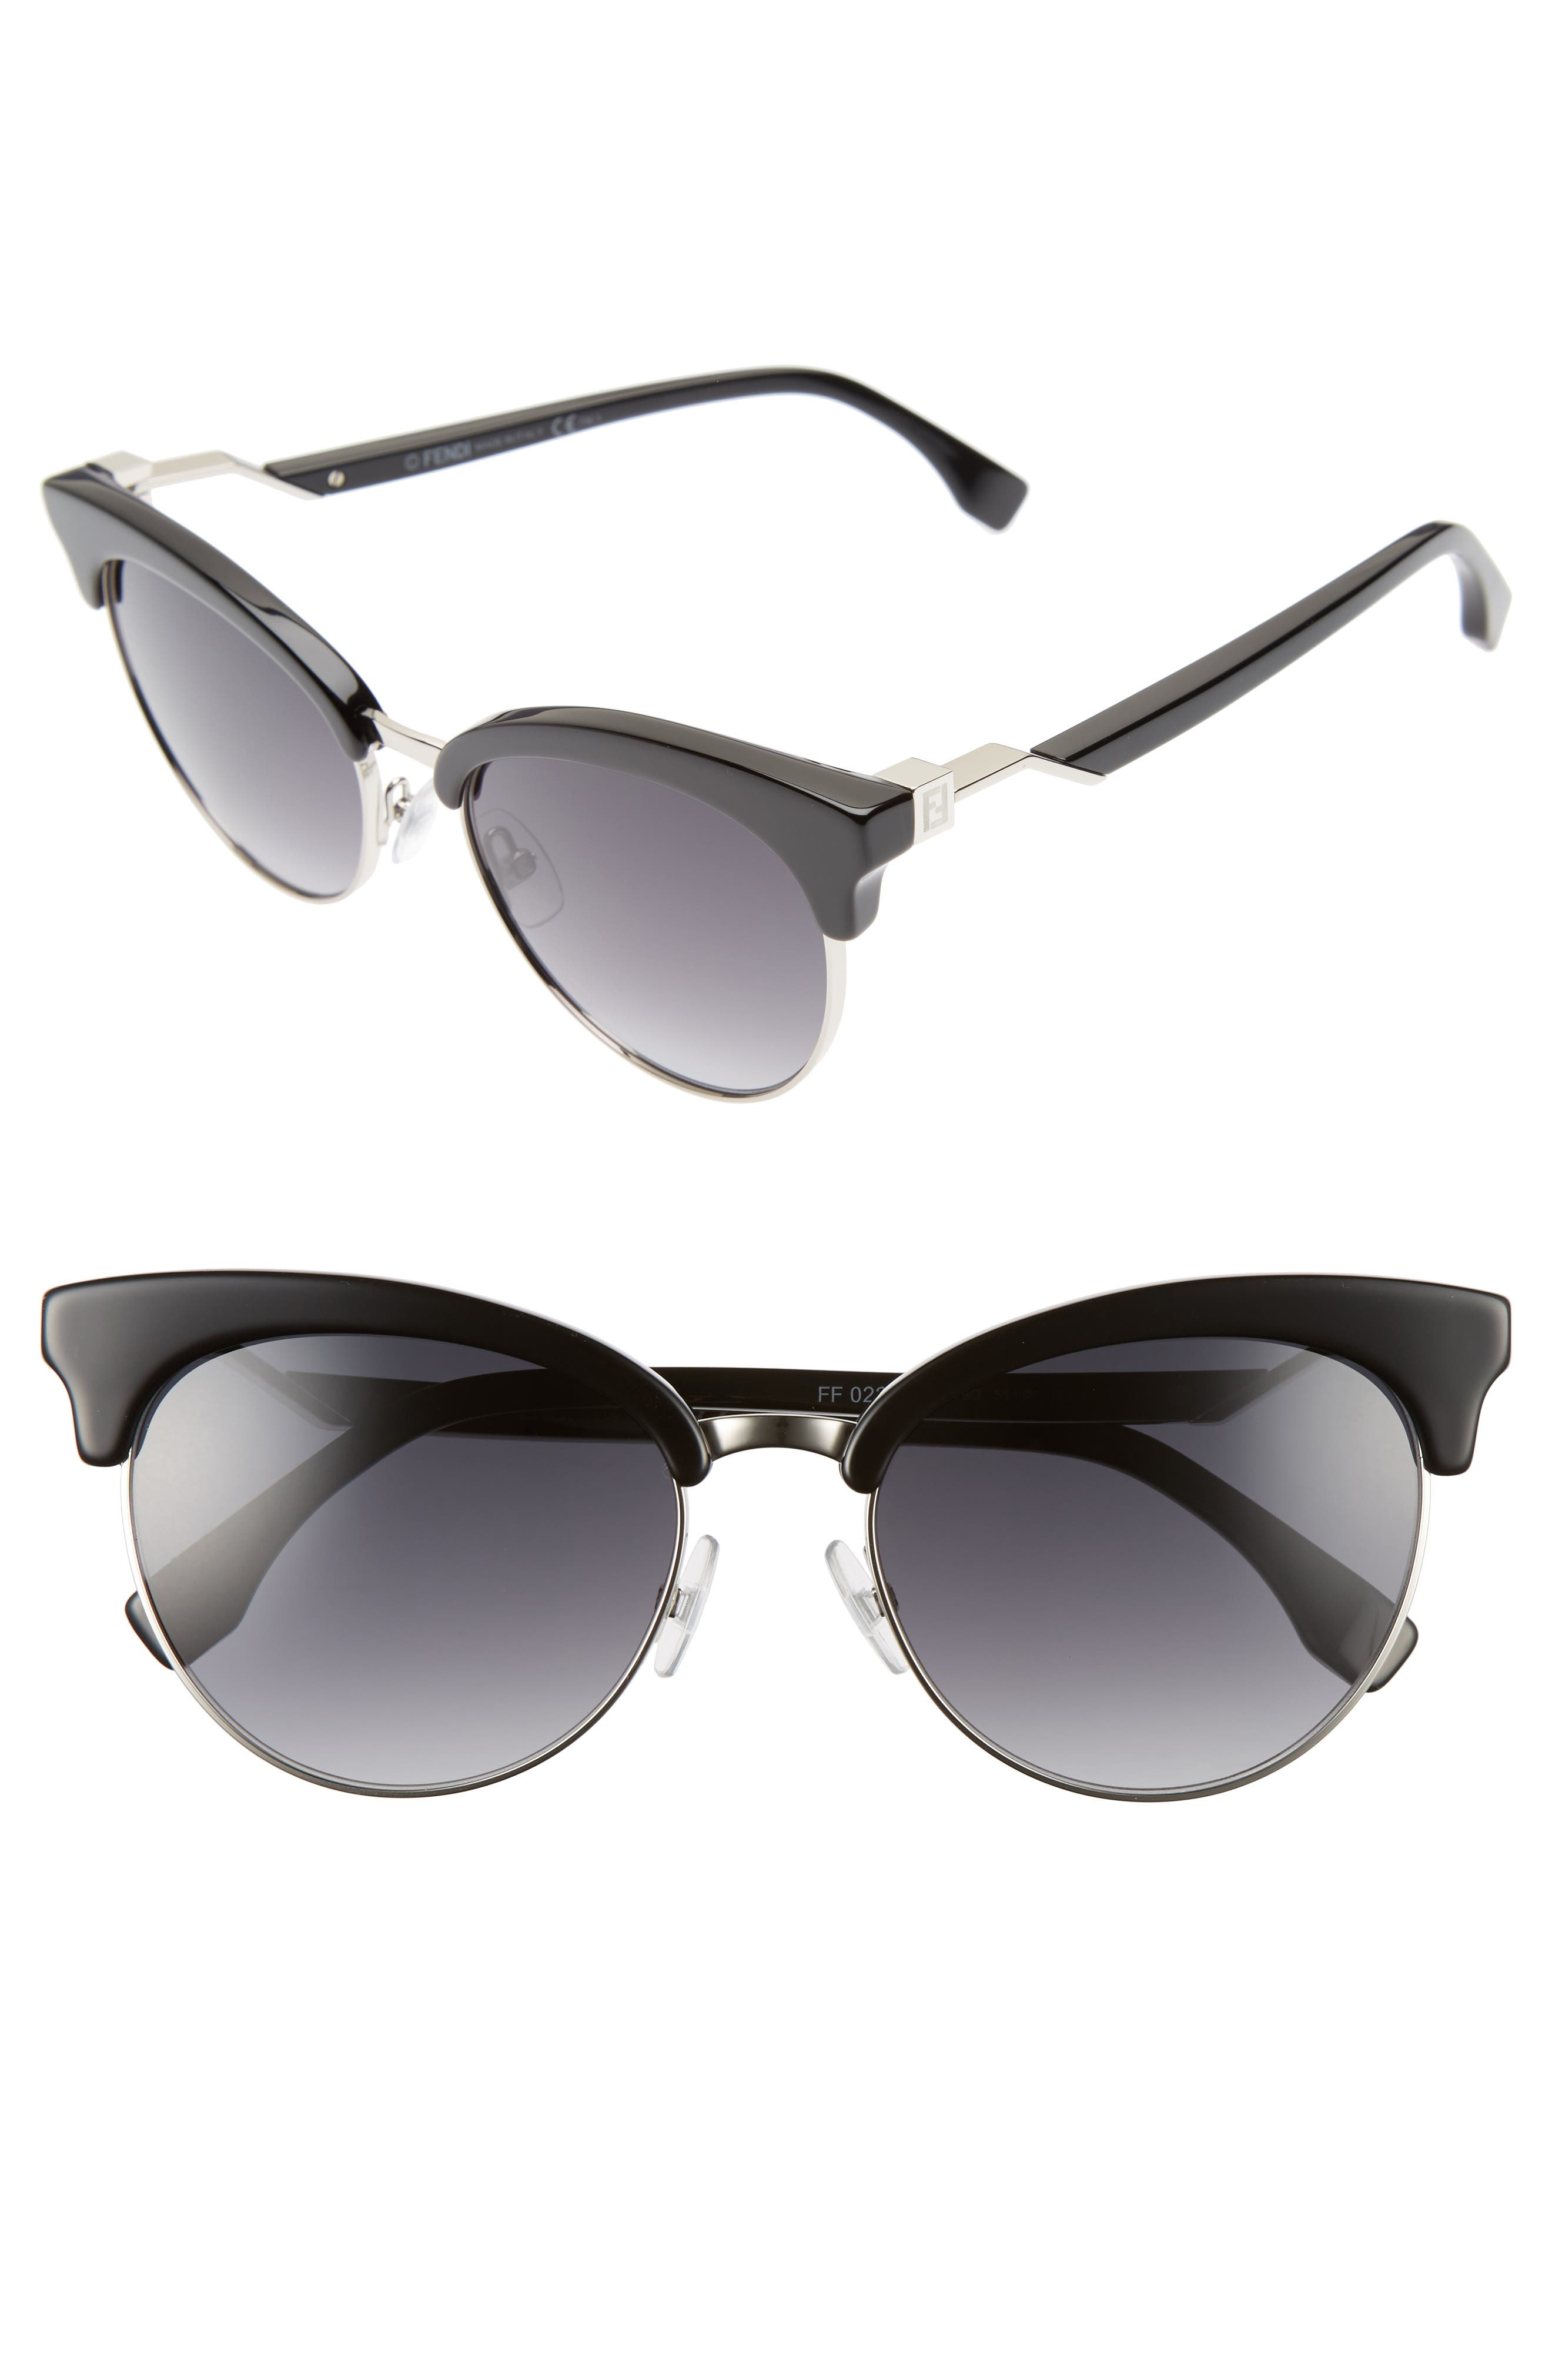 55mm Gradient Lens Cat Eye Sunglasses,                         Main,                         color, 001